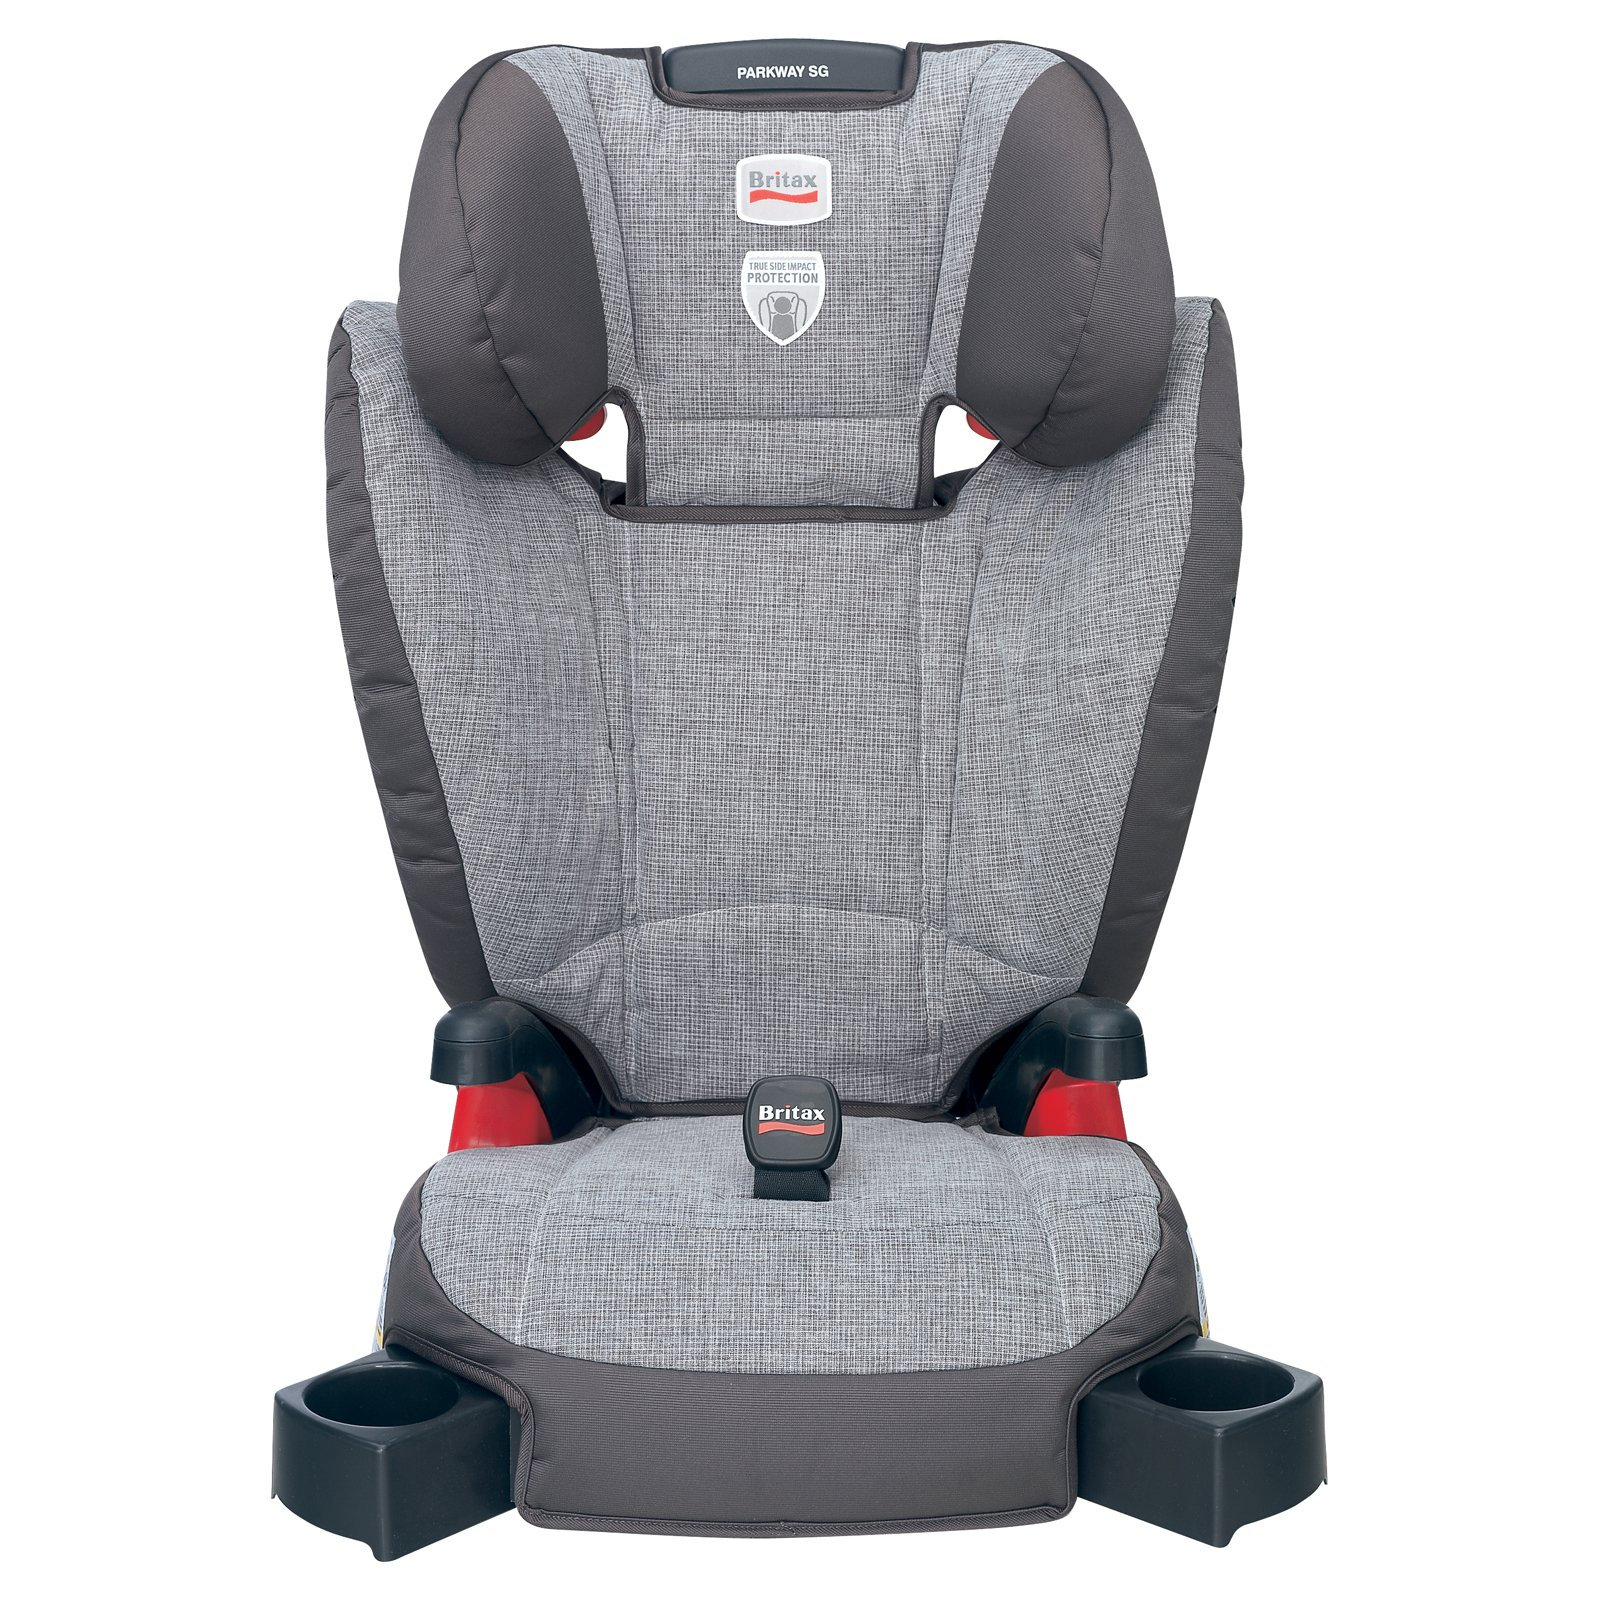 Britax Parkway SG Booster Car Seat - Gridline